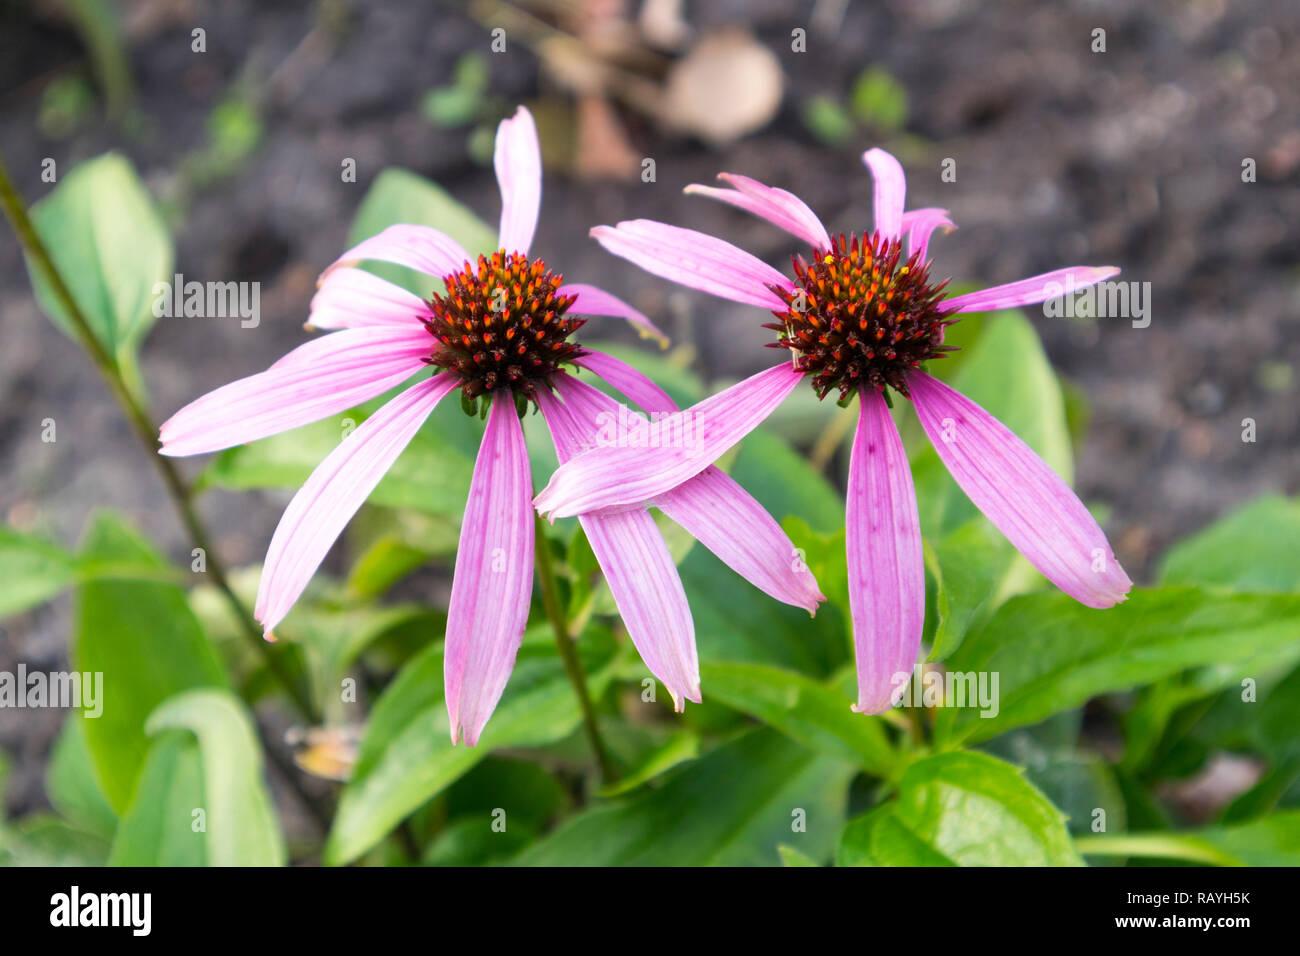 Echinacea purpurea two late flowers in autumn day. - Stock Image